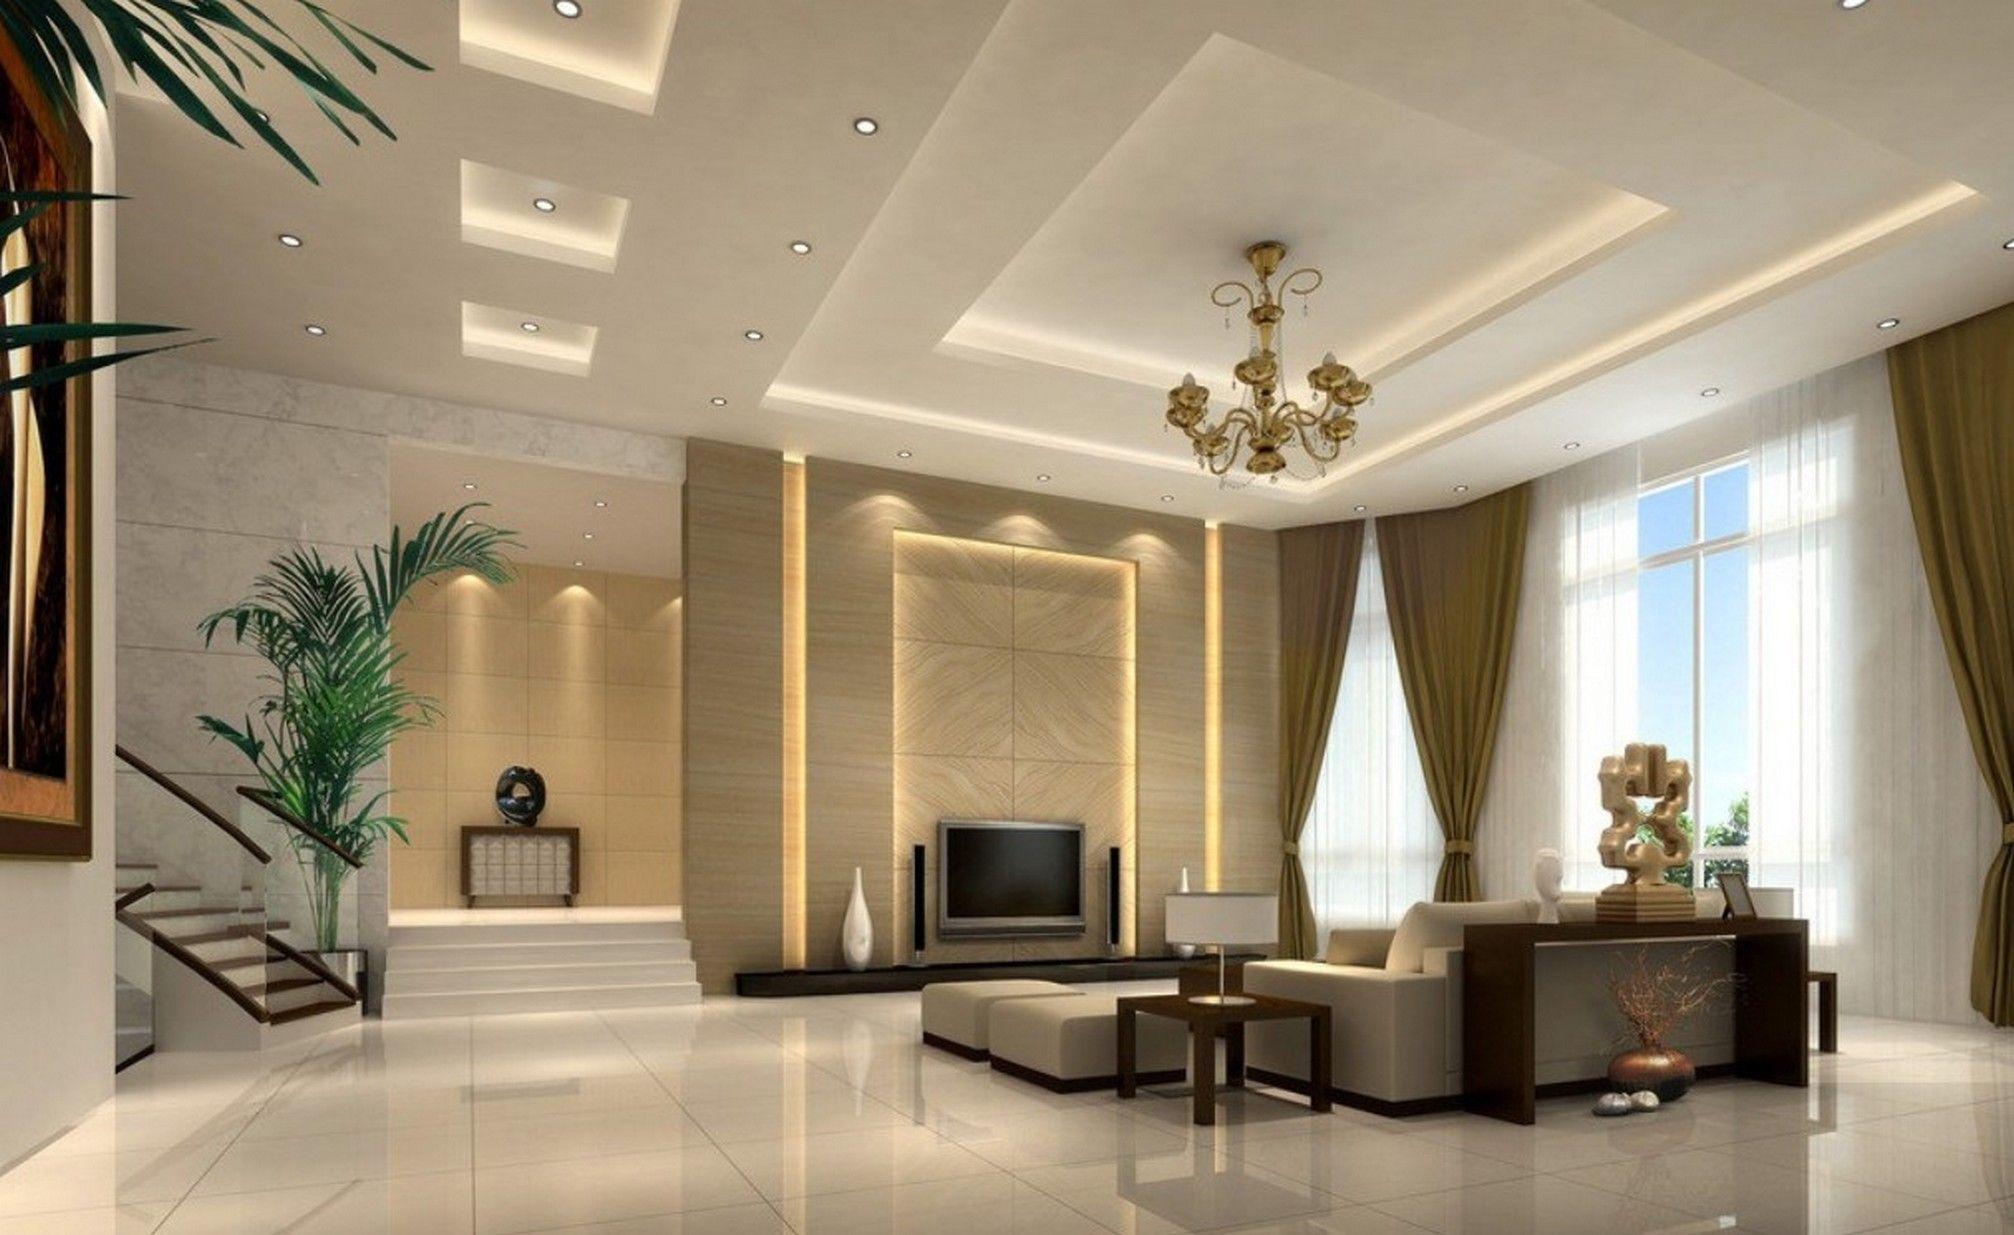 Pin By Dcsmasr On Gypsum Board Ceiling Design Living Room